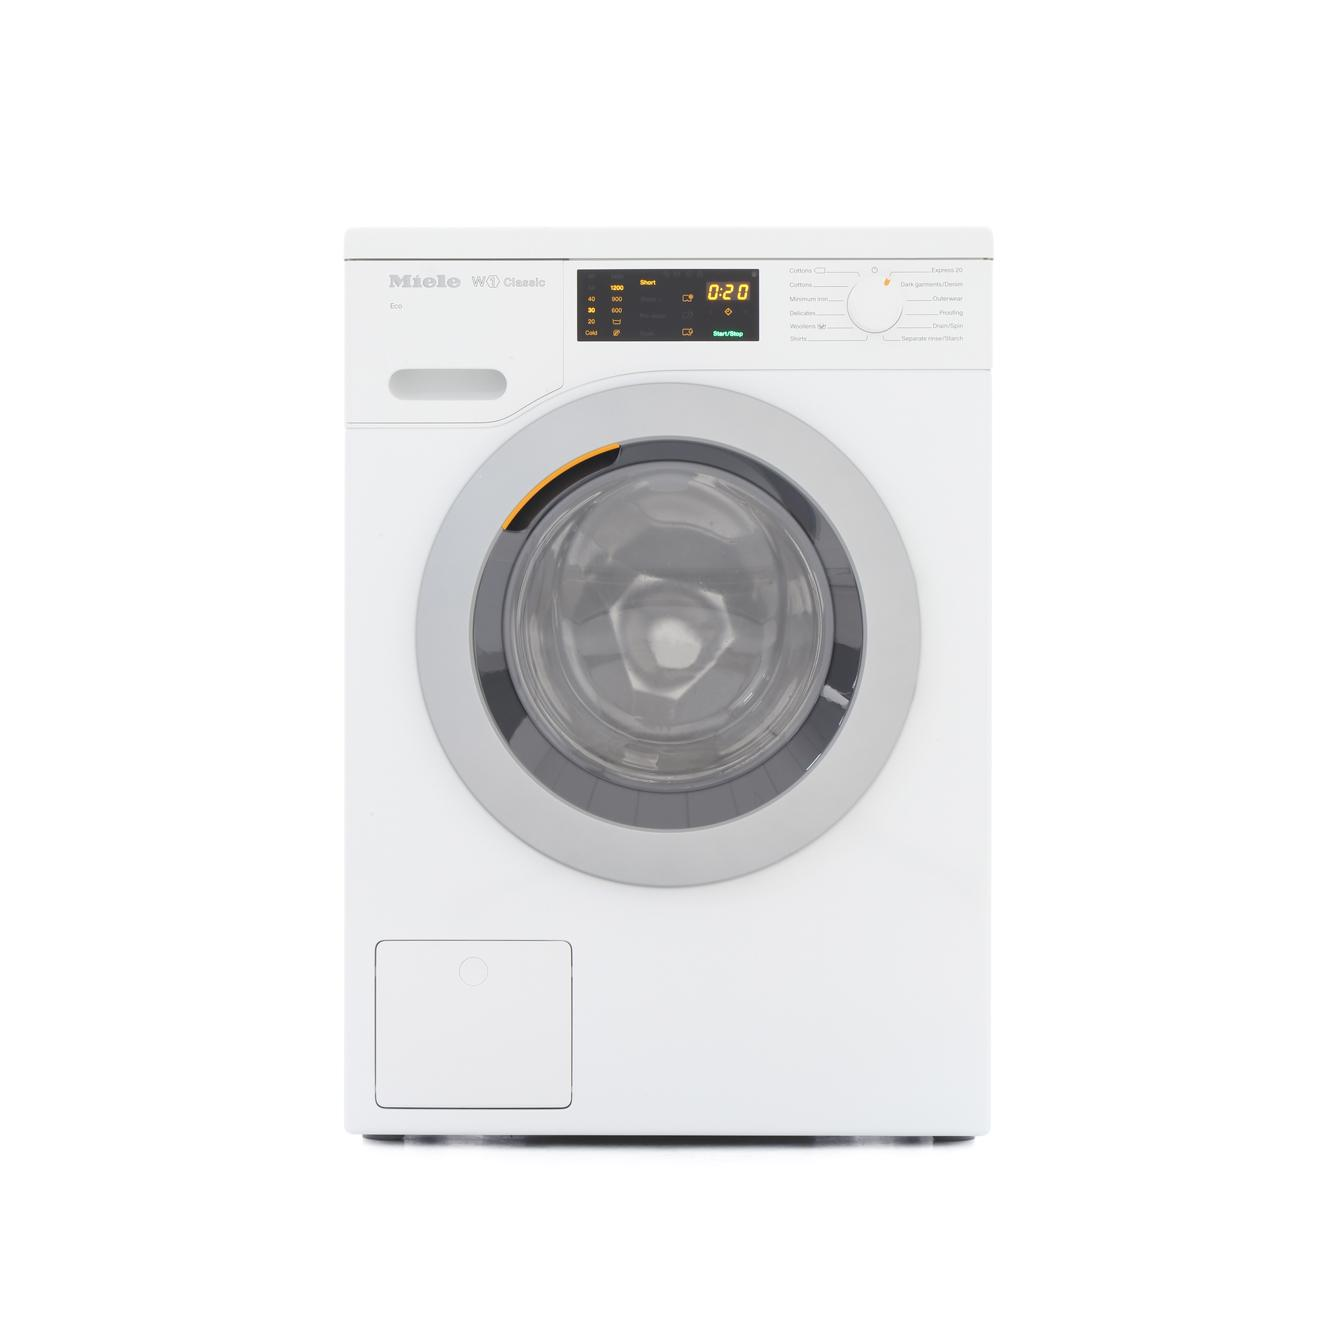 Miele WDB020 Eco W1 Classic HomeCare 7kg Washing Machine | G